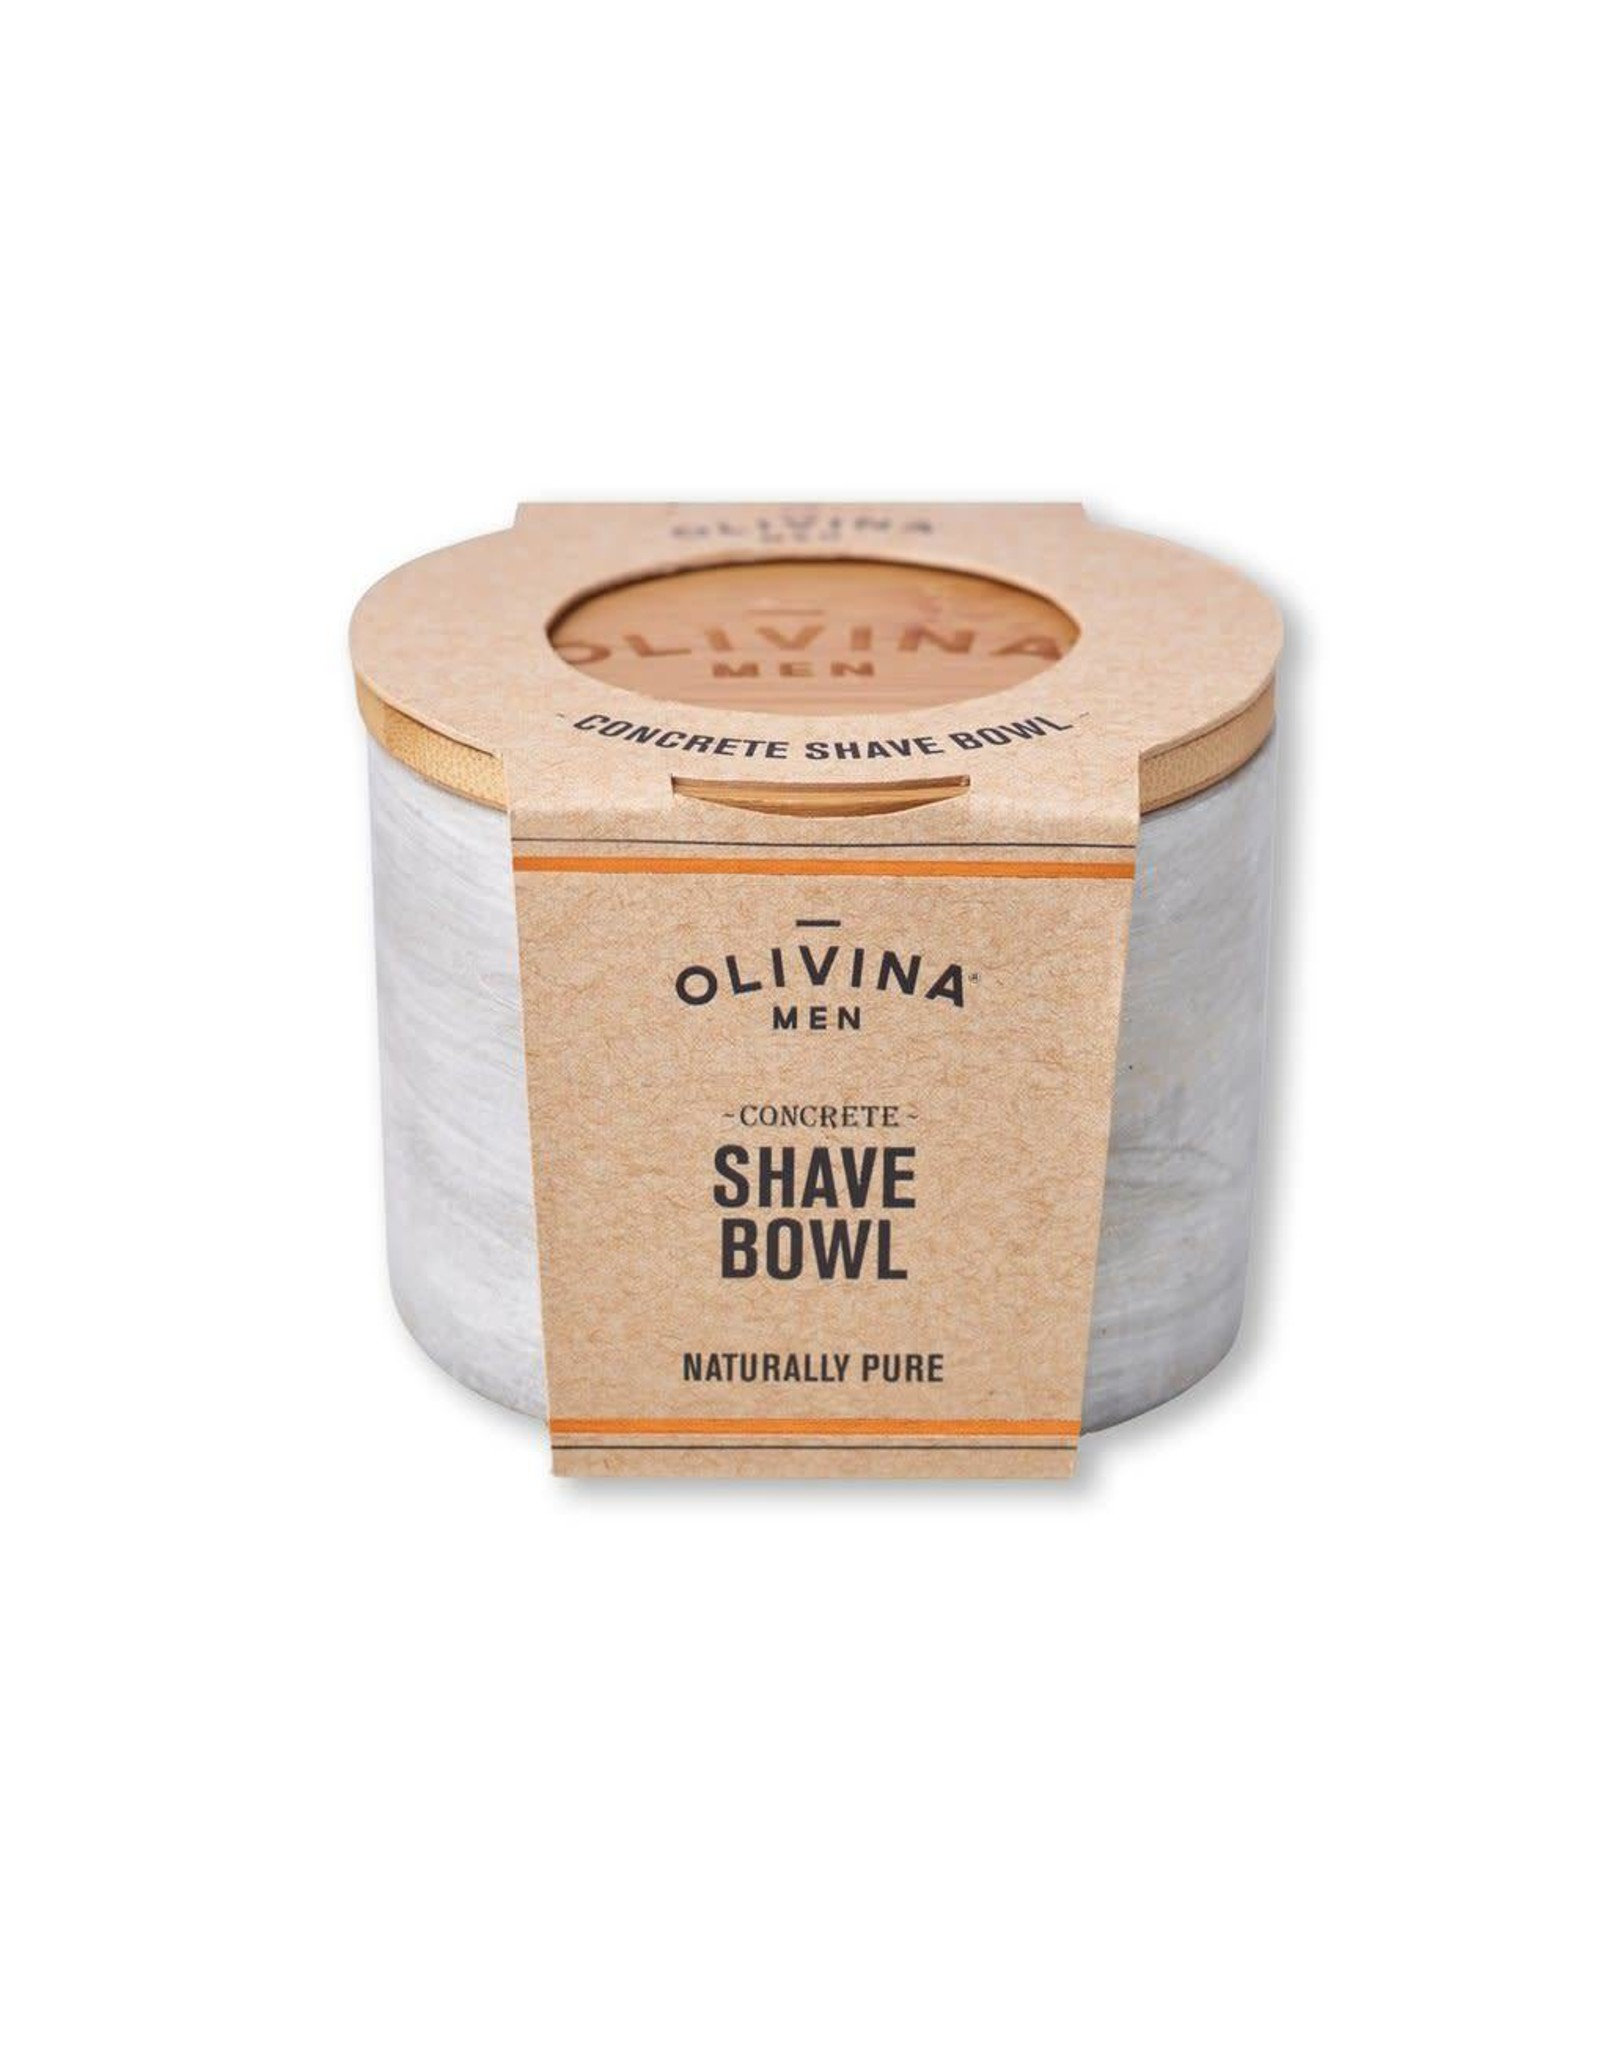 Olivina Men Concrete Shave Bowl